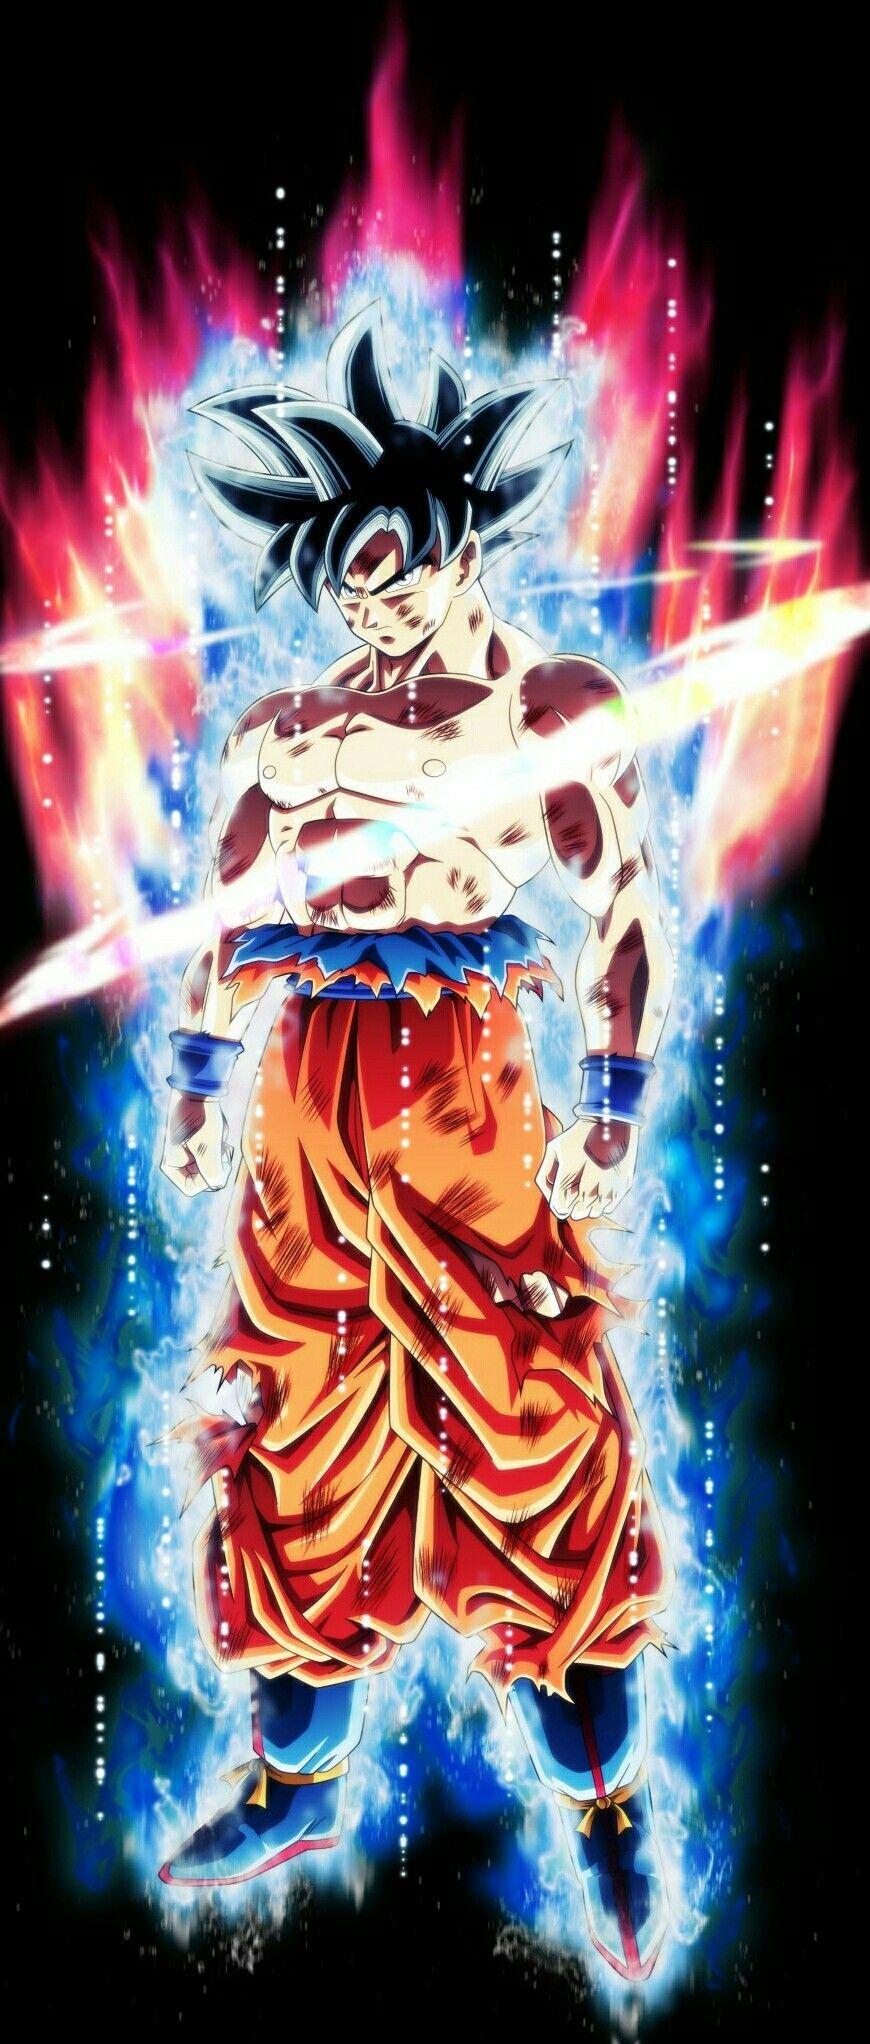 Dragon Ball Super Goku Ultra Instinct Hd Wallpaper 4k Goku Ultra Instinct Wallpapers Free Pict In 2020 Dragon Ball Super Goku Anime Dragon Ball Super Dragon Ball Goku